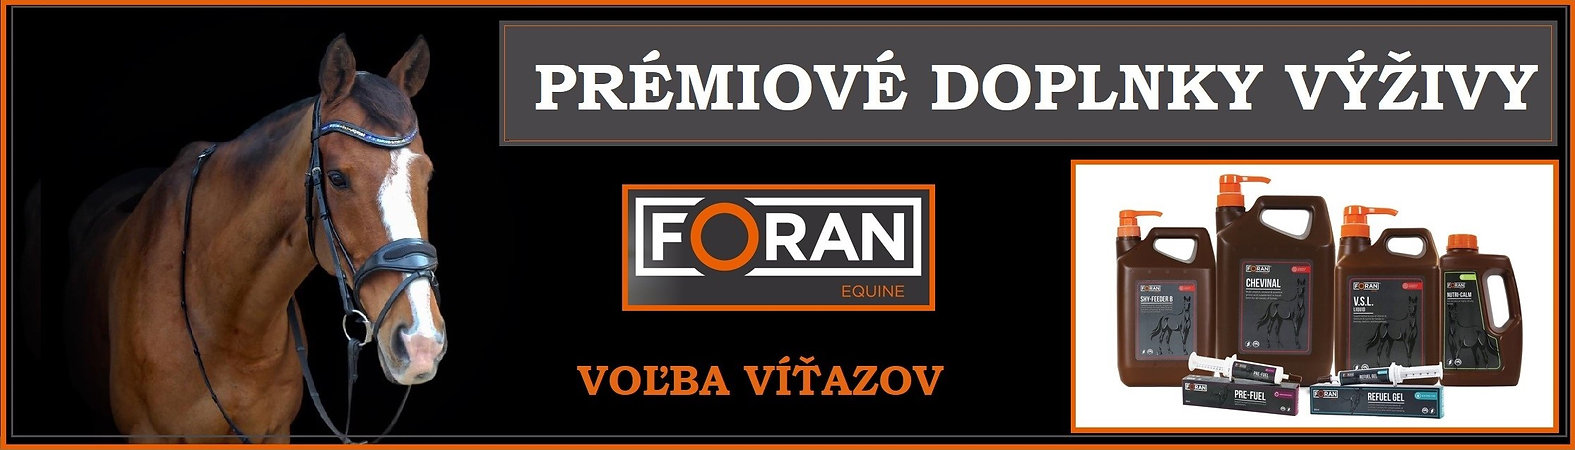 FORAN-LGCT-USA-Web-banners2.jpg